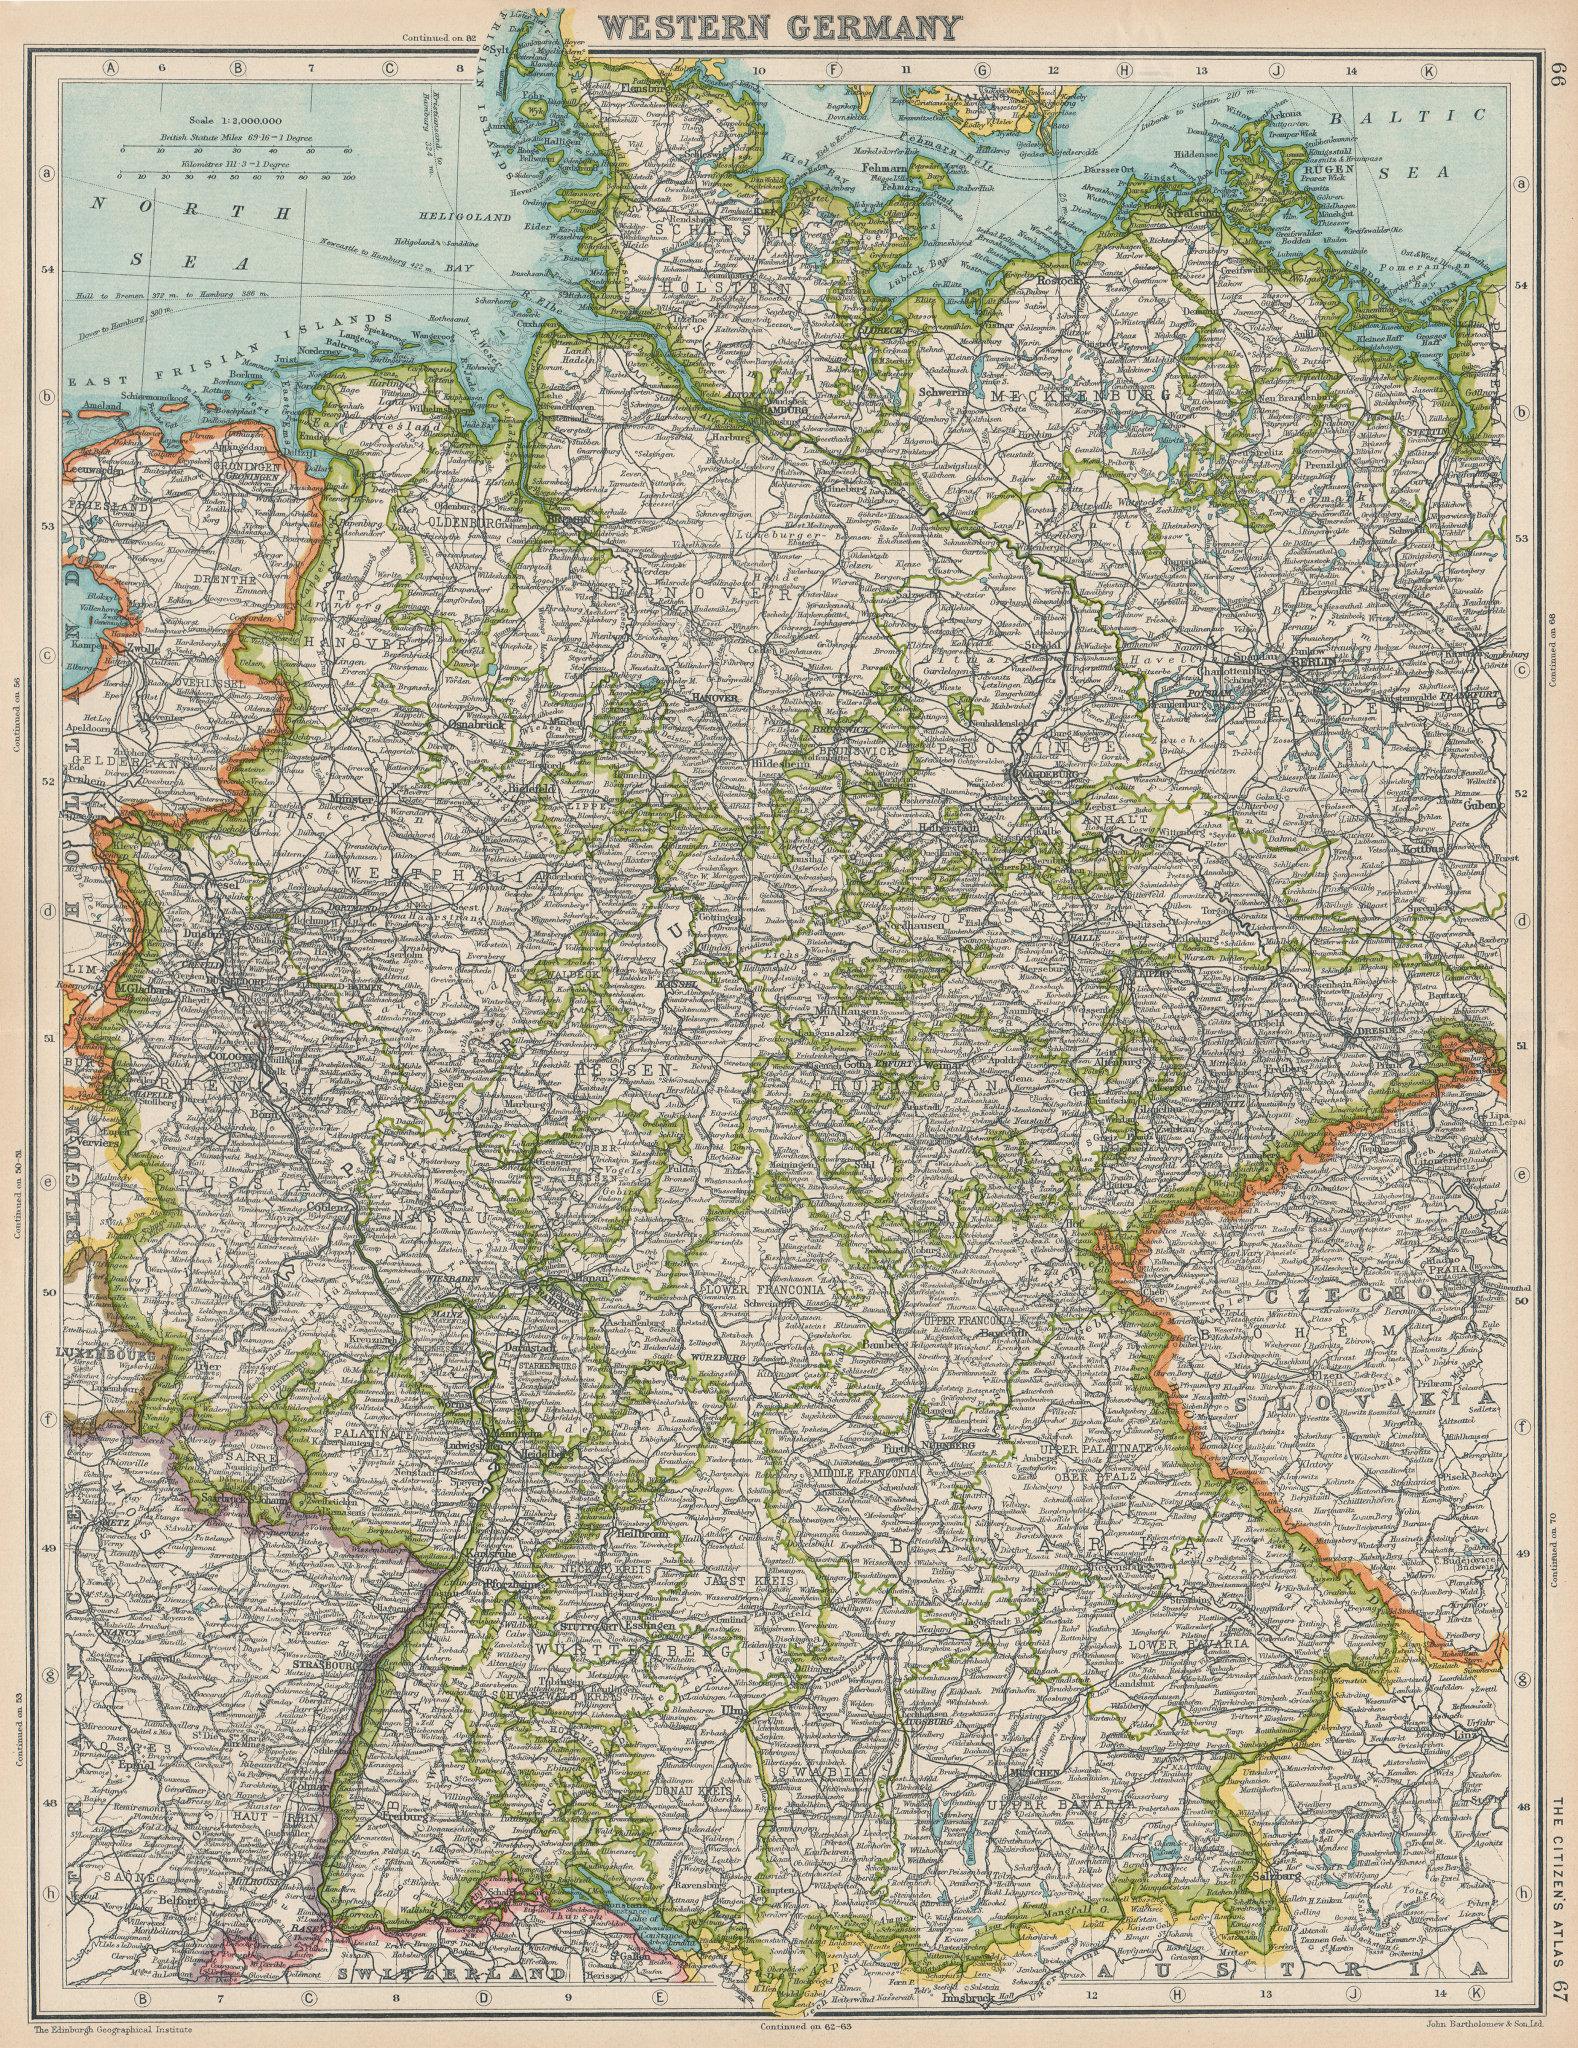 WESTERN GERMANY. Shows Saarbeckengebiet under League of Nations mandate 1924 map